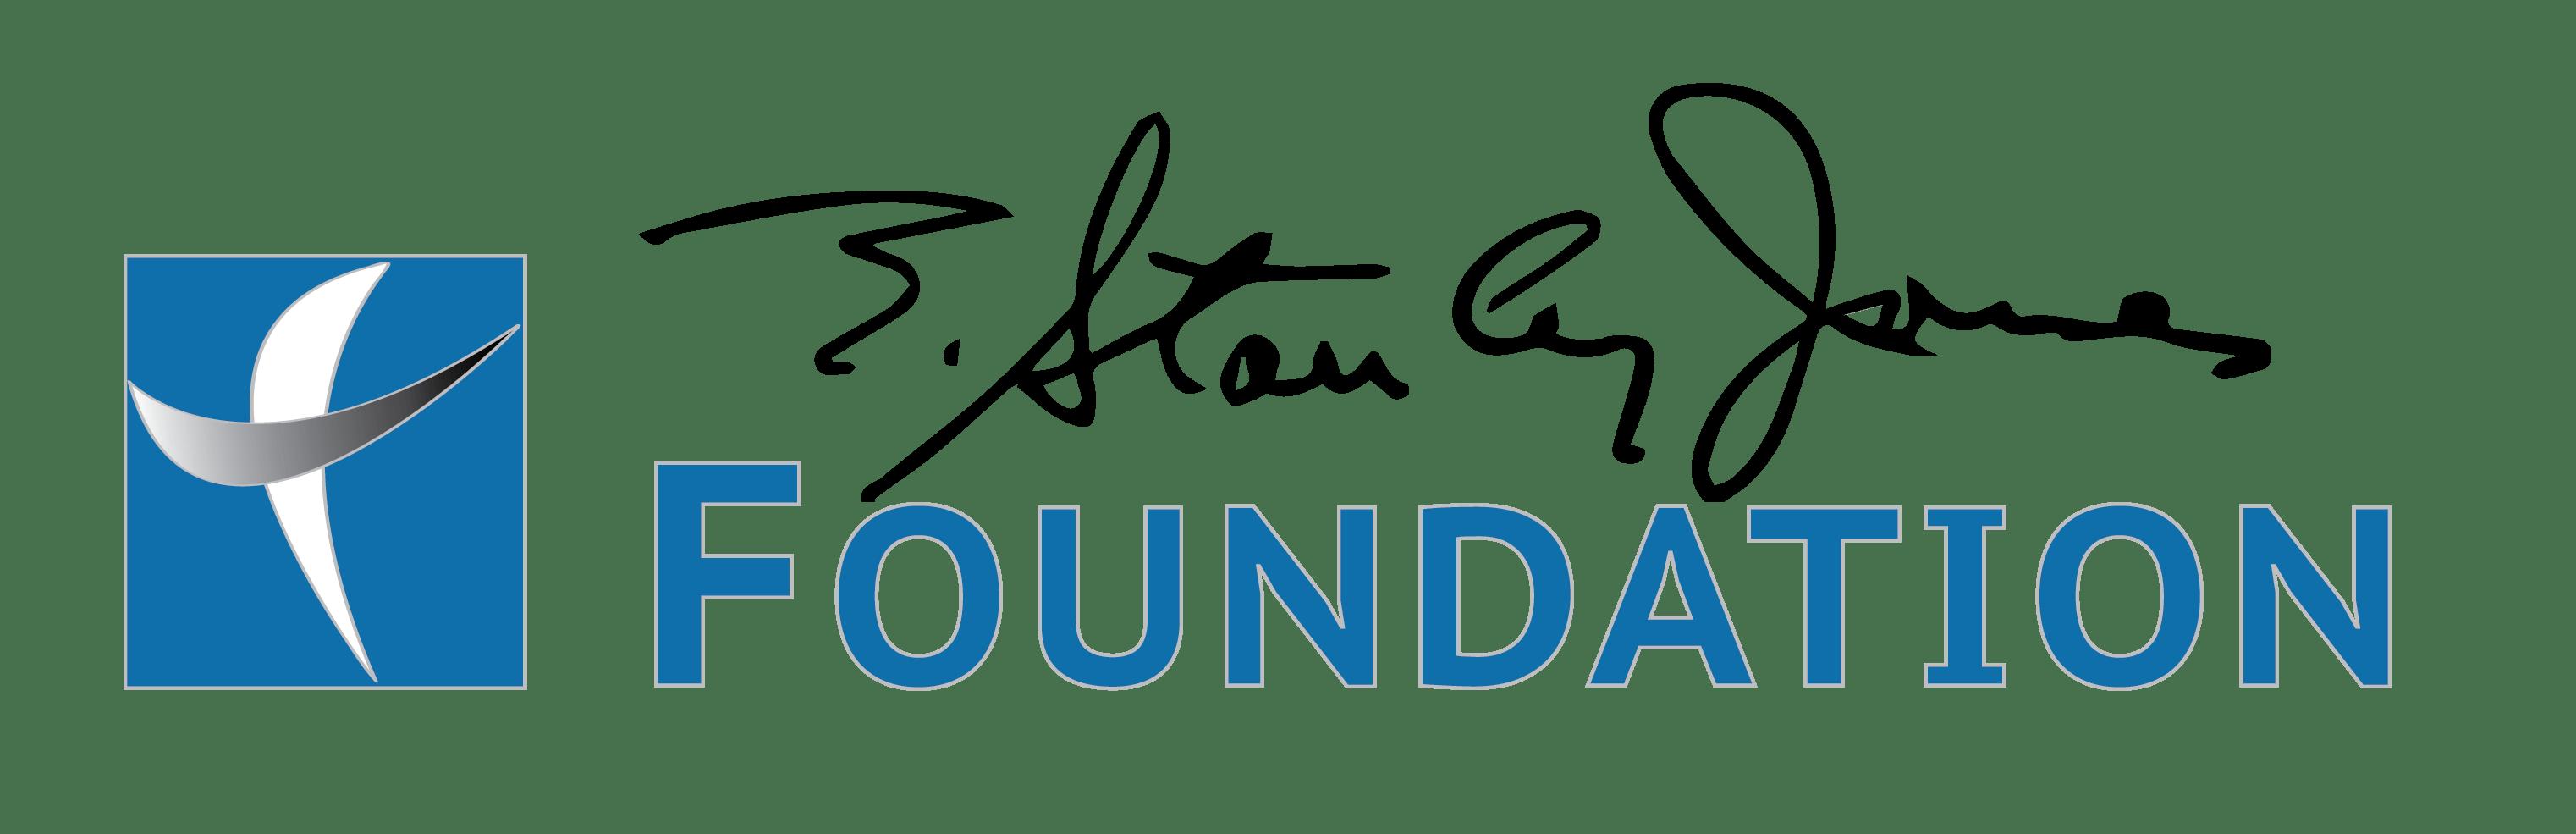 The E. Stanley Jones Foundation